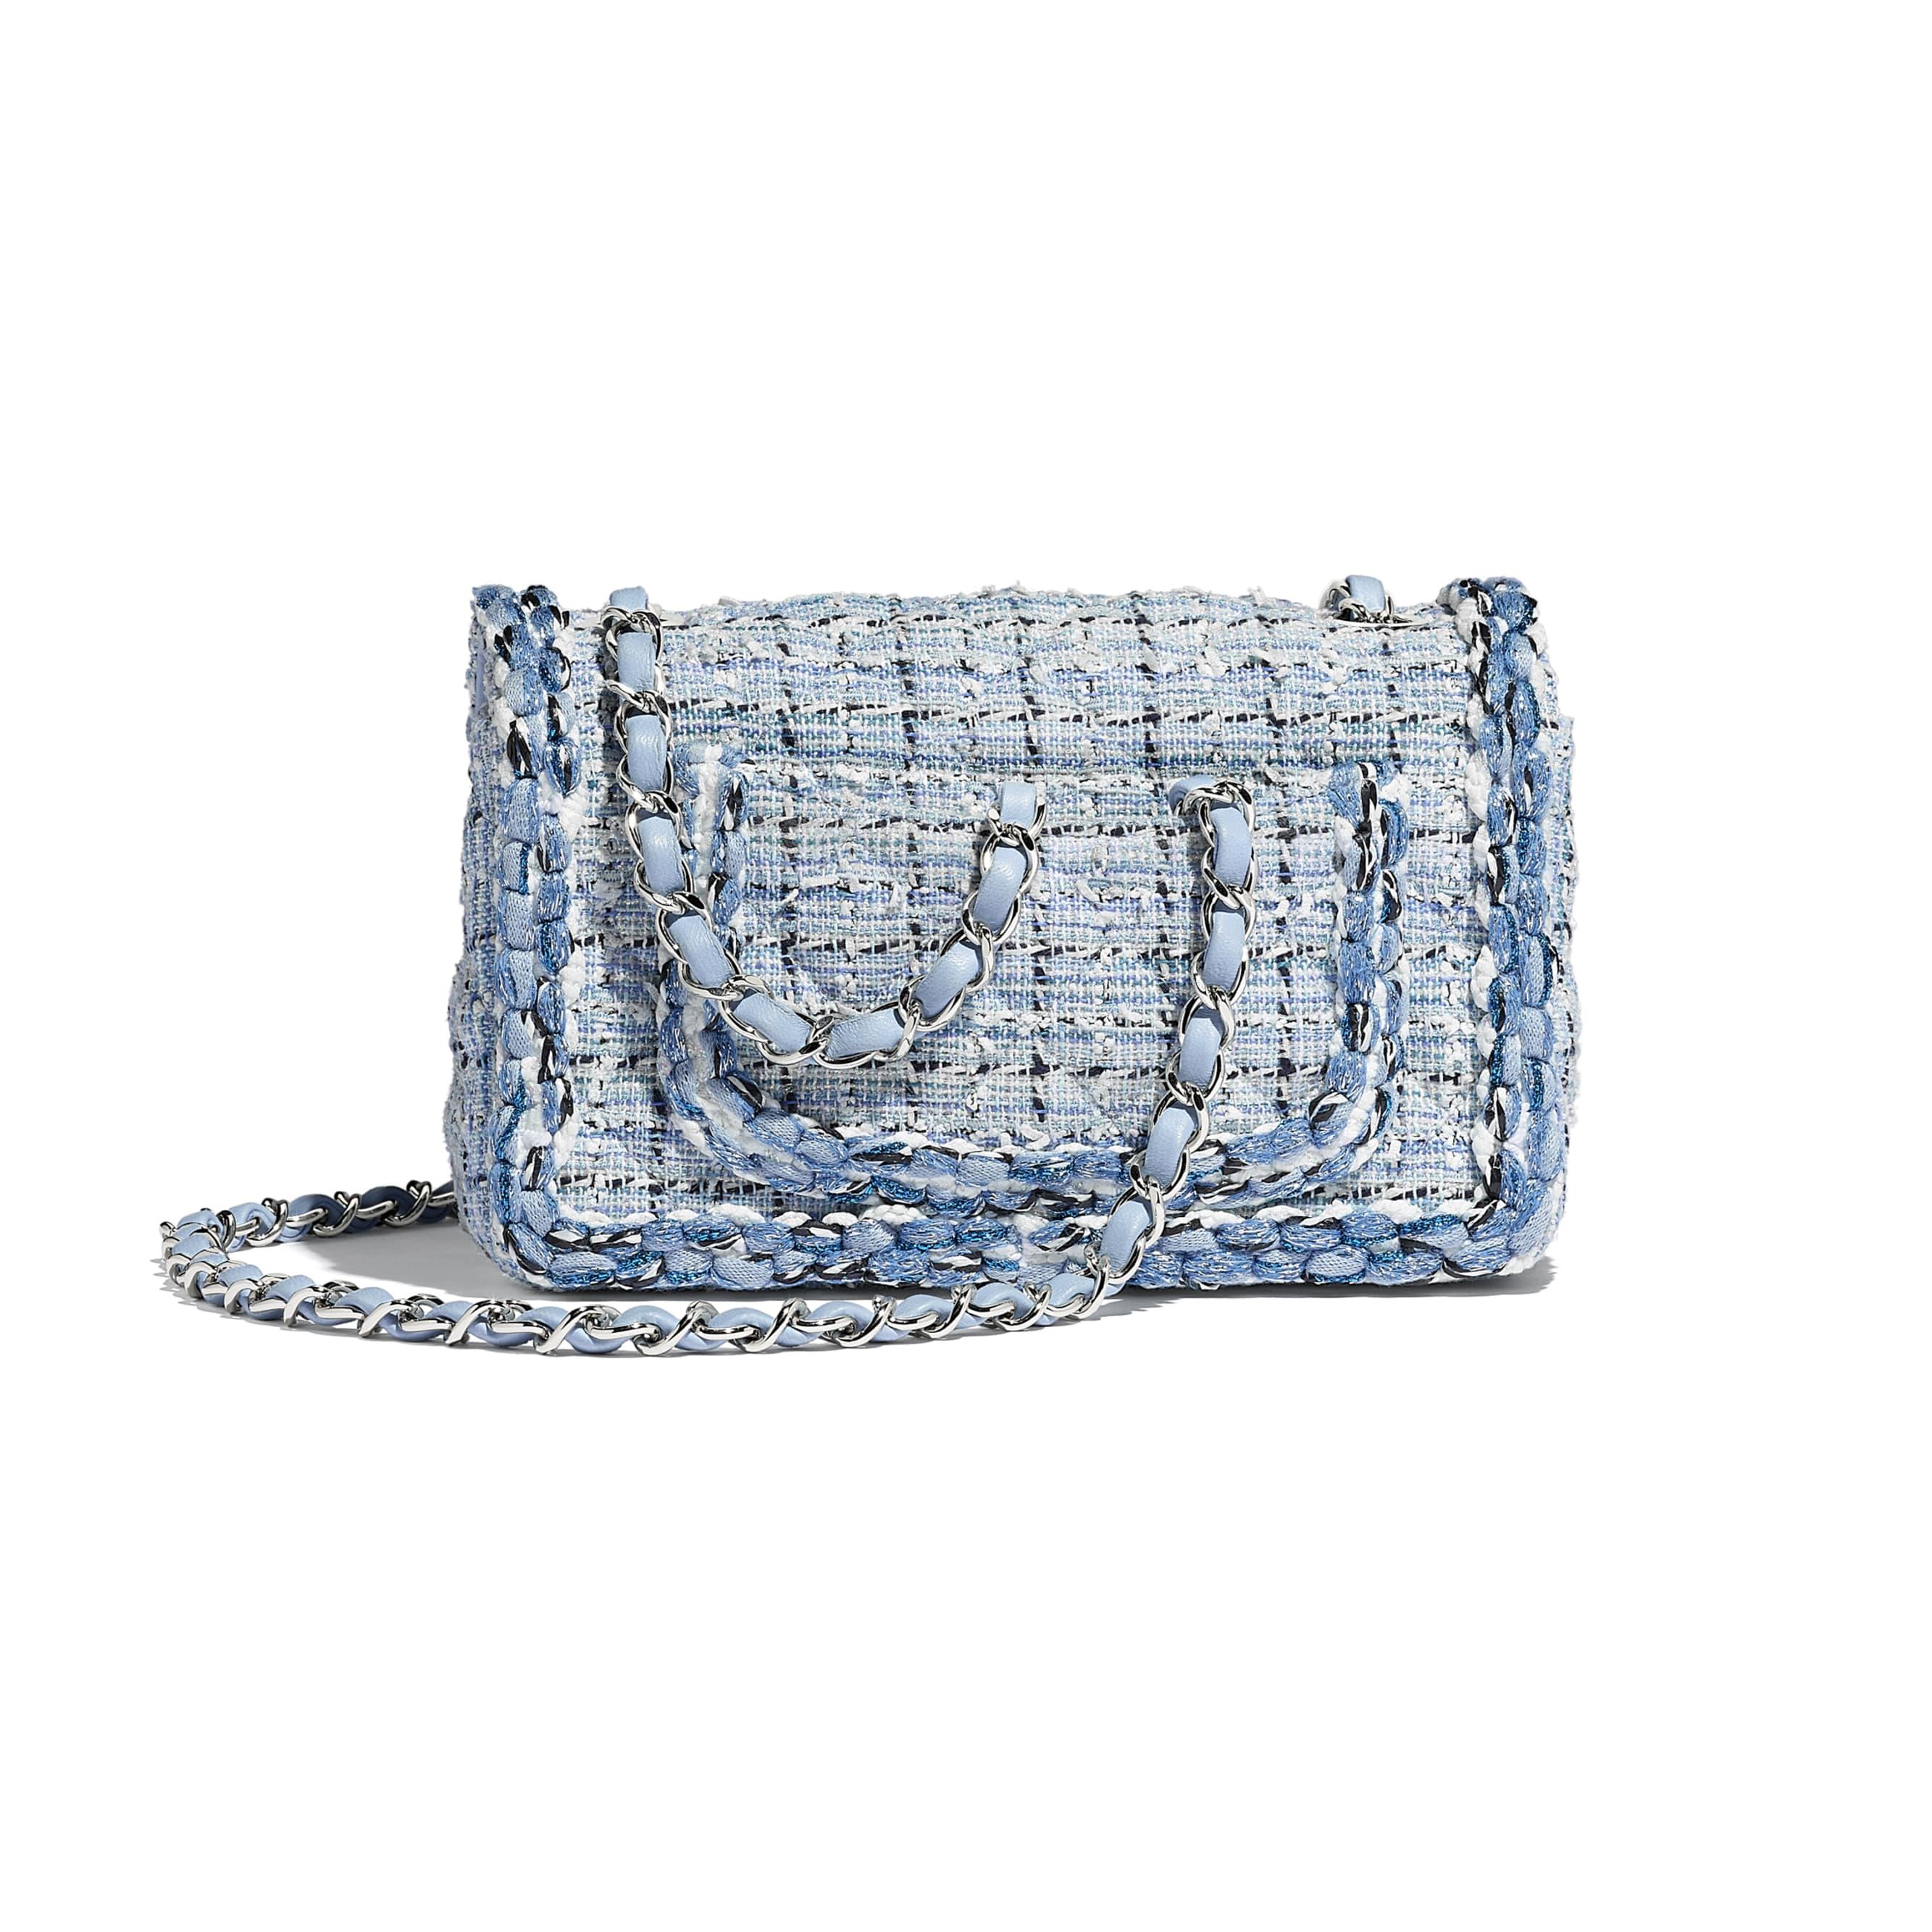 Mini Flap Bag - Blue & White - Tweed, Braid & Silver-Tone Metal - Alternative view - see standard sized version